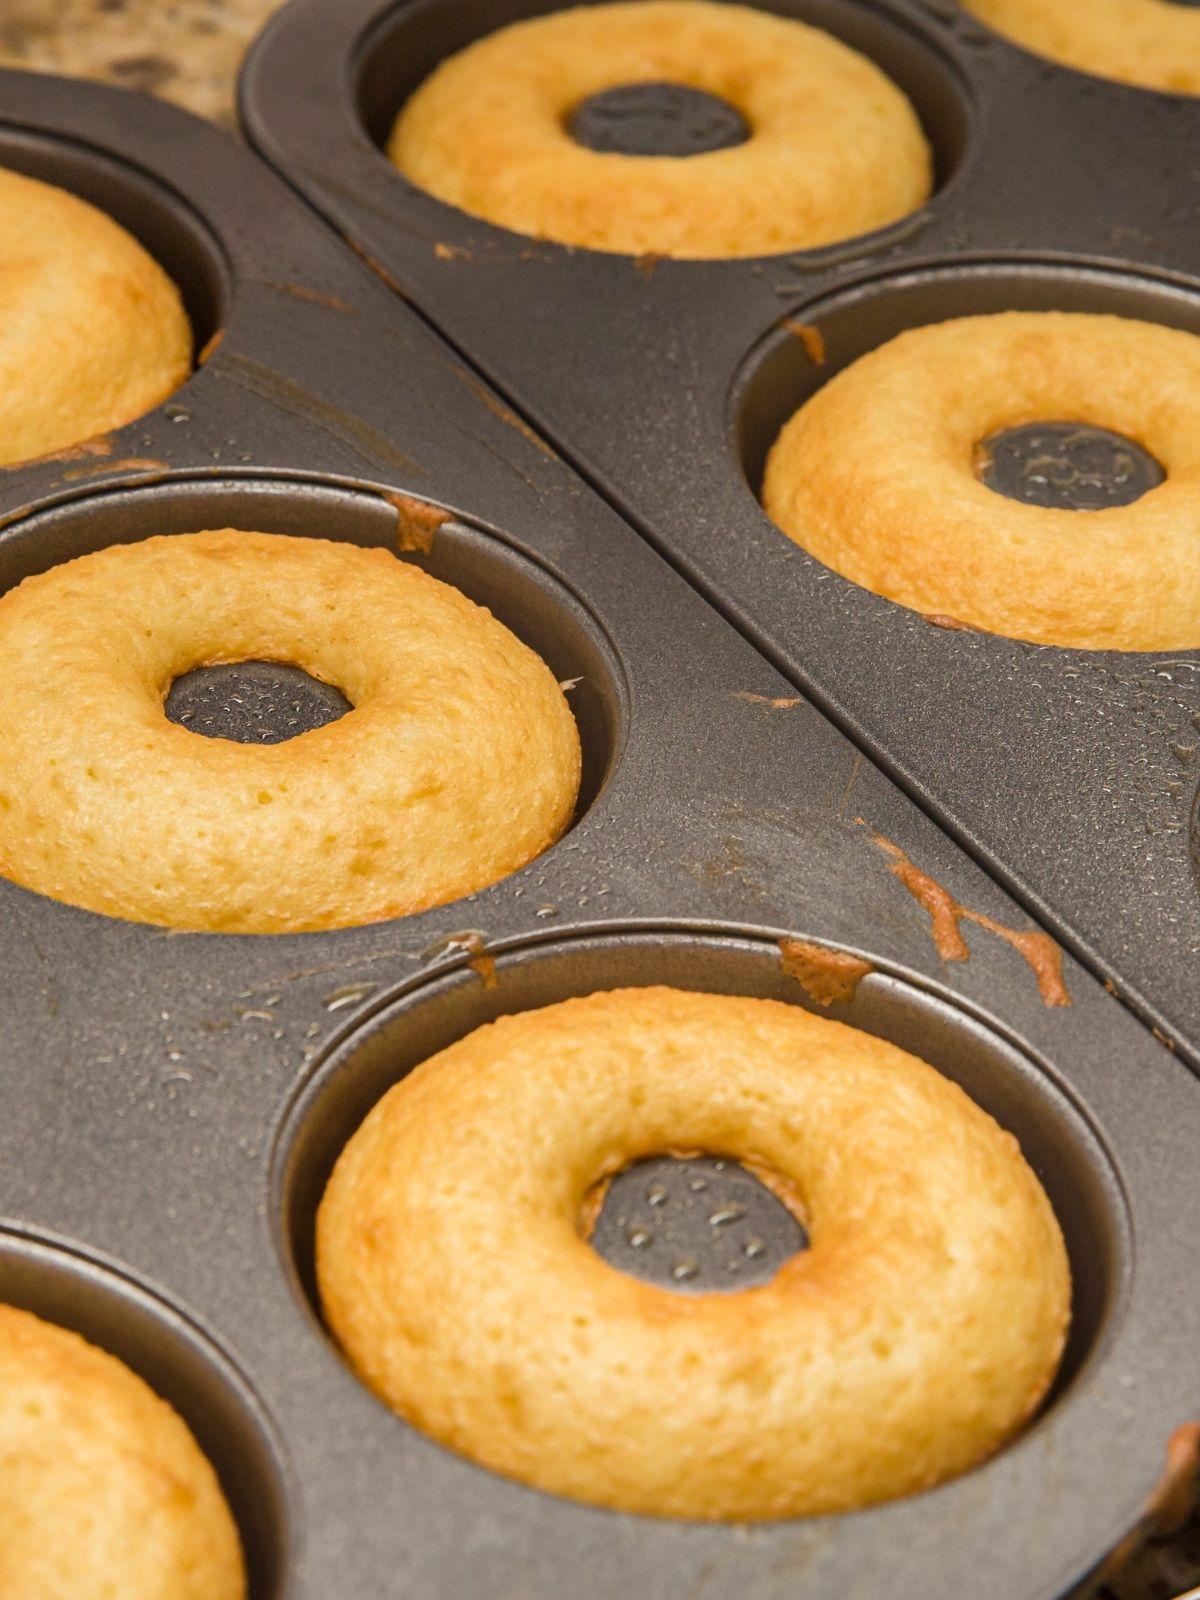 Pumpkin Donuts Baked in donut pan.